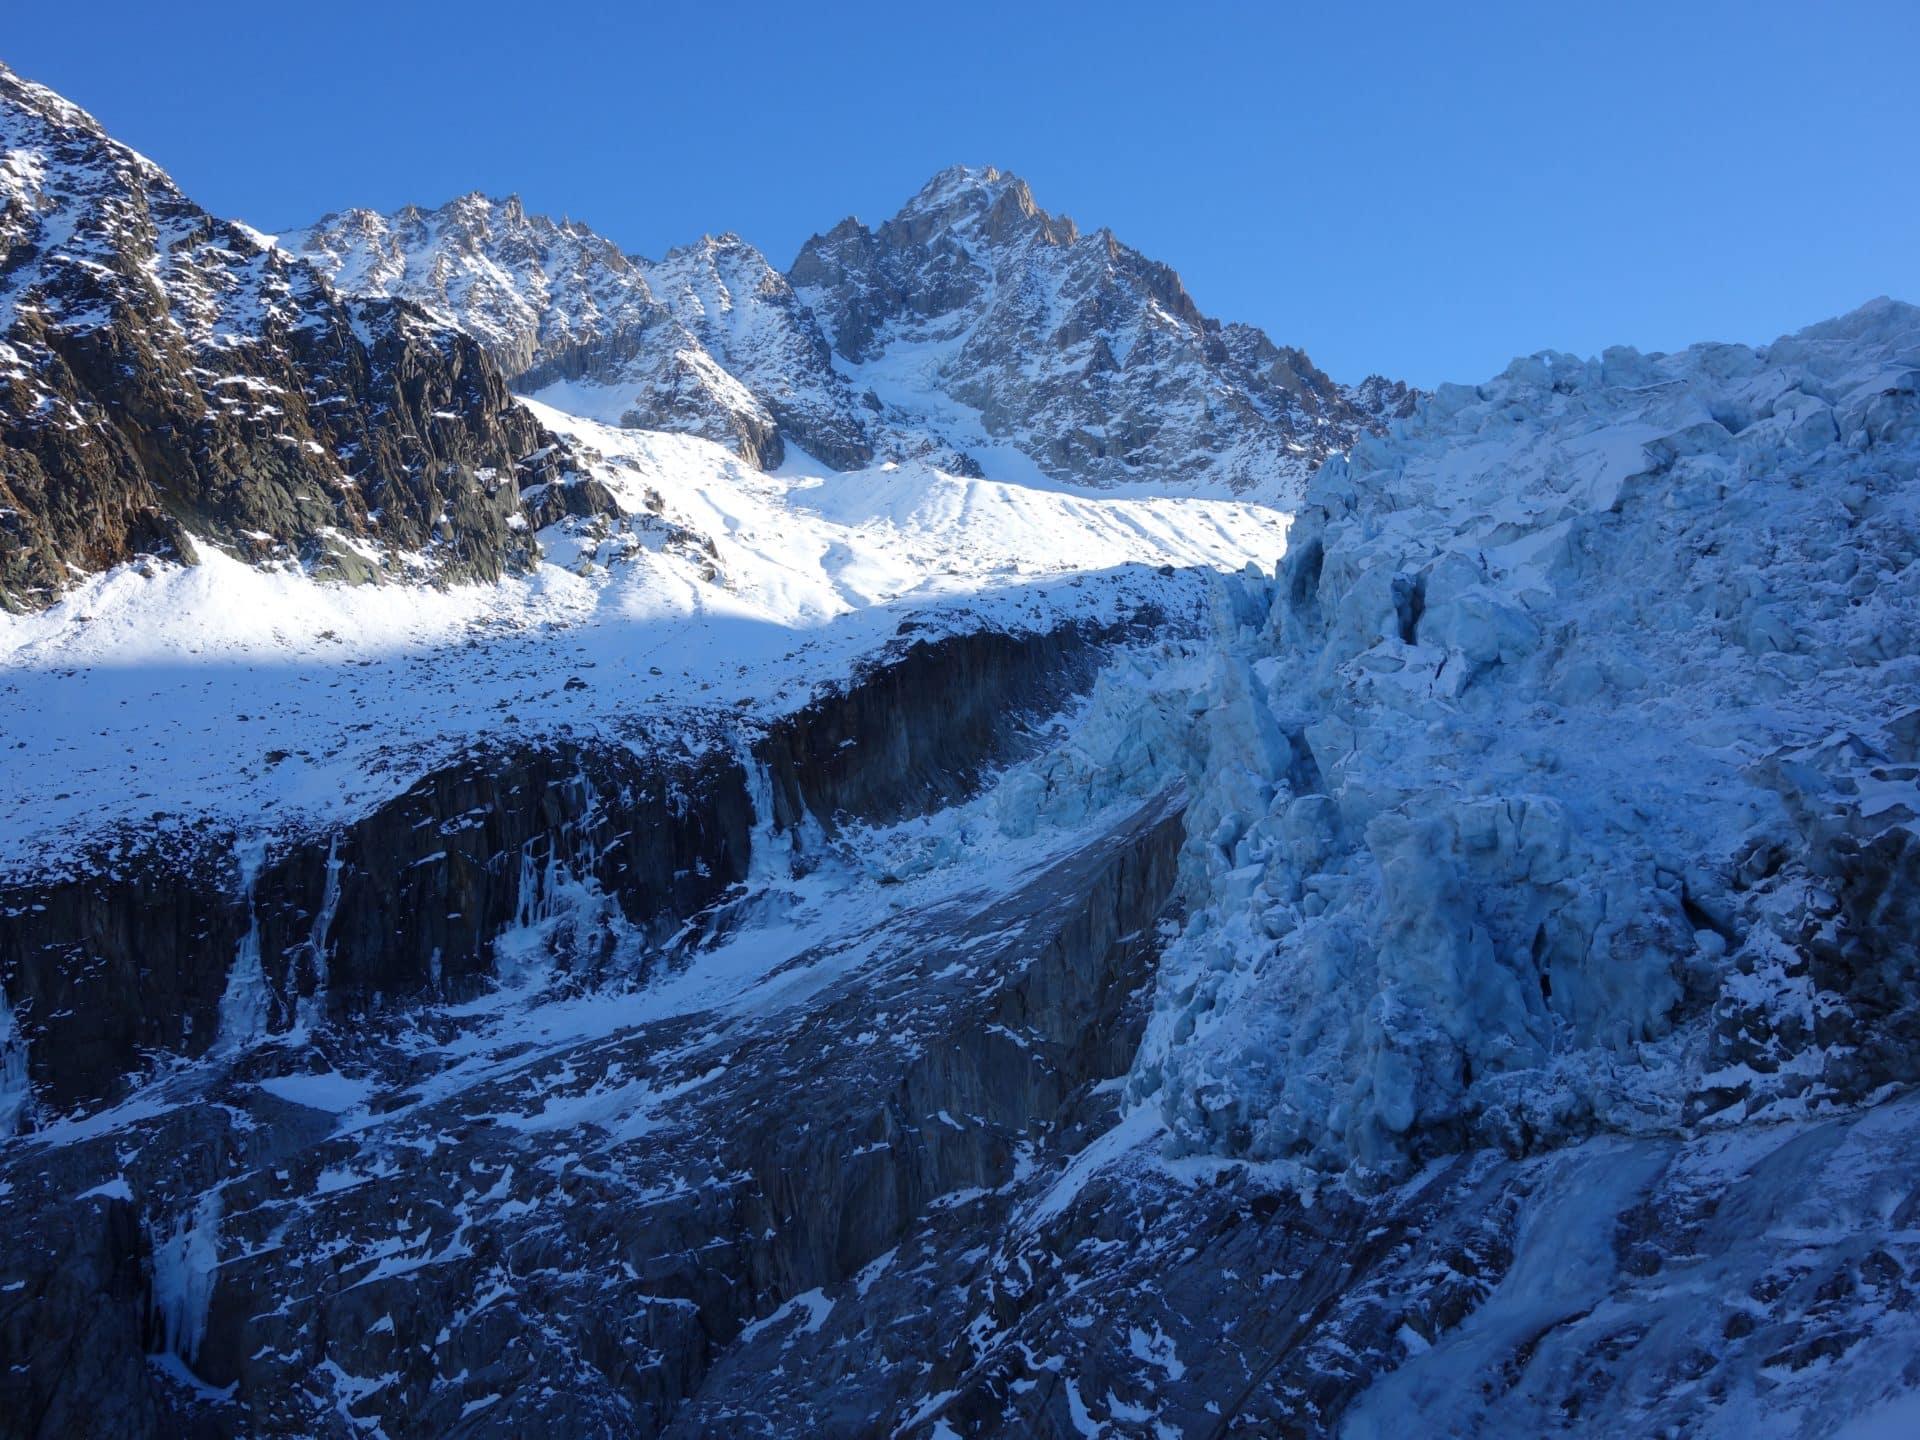 Chamonix guided ice climbing weekend